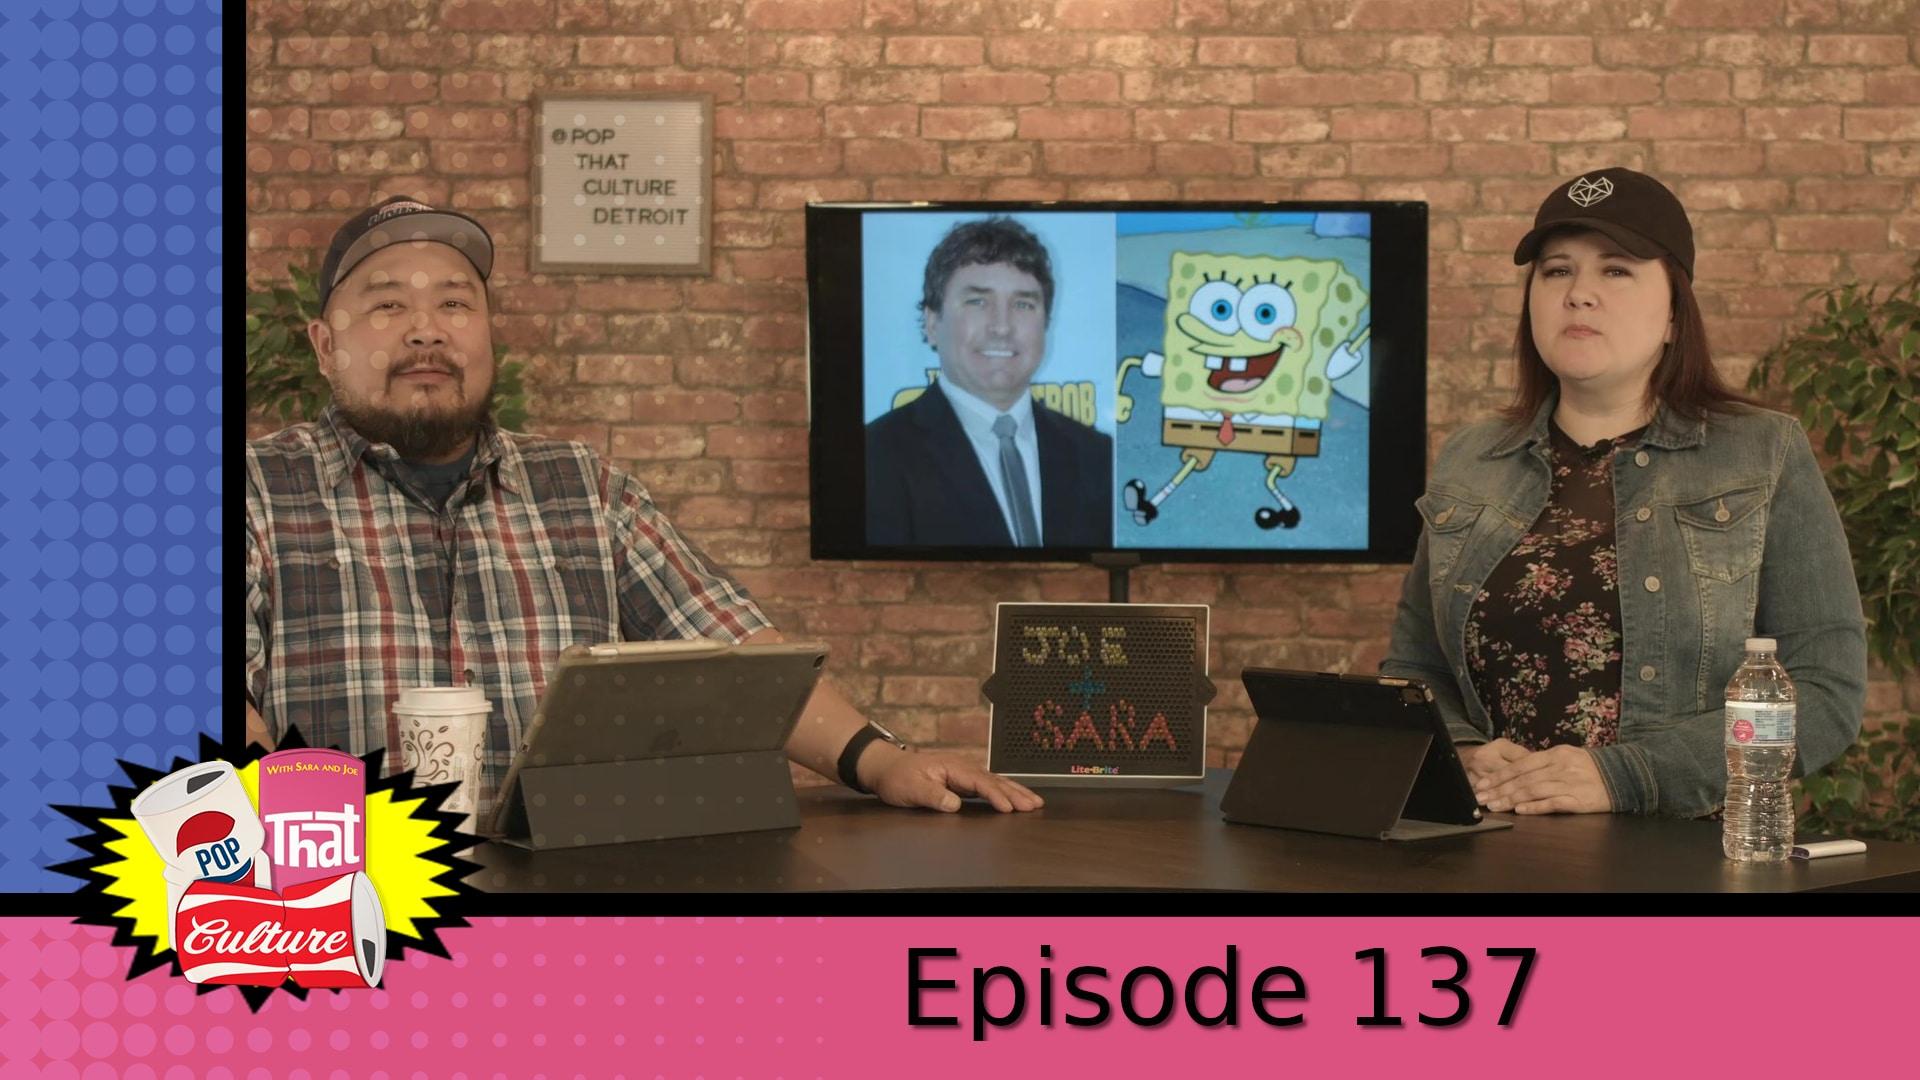 Pop That Culture - Episode 137